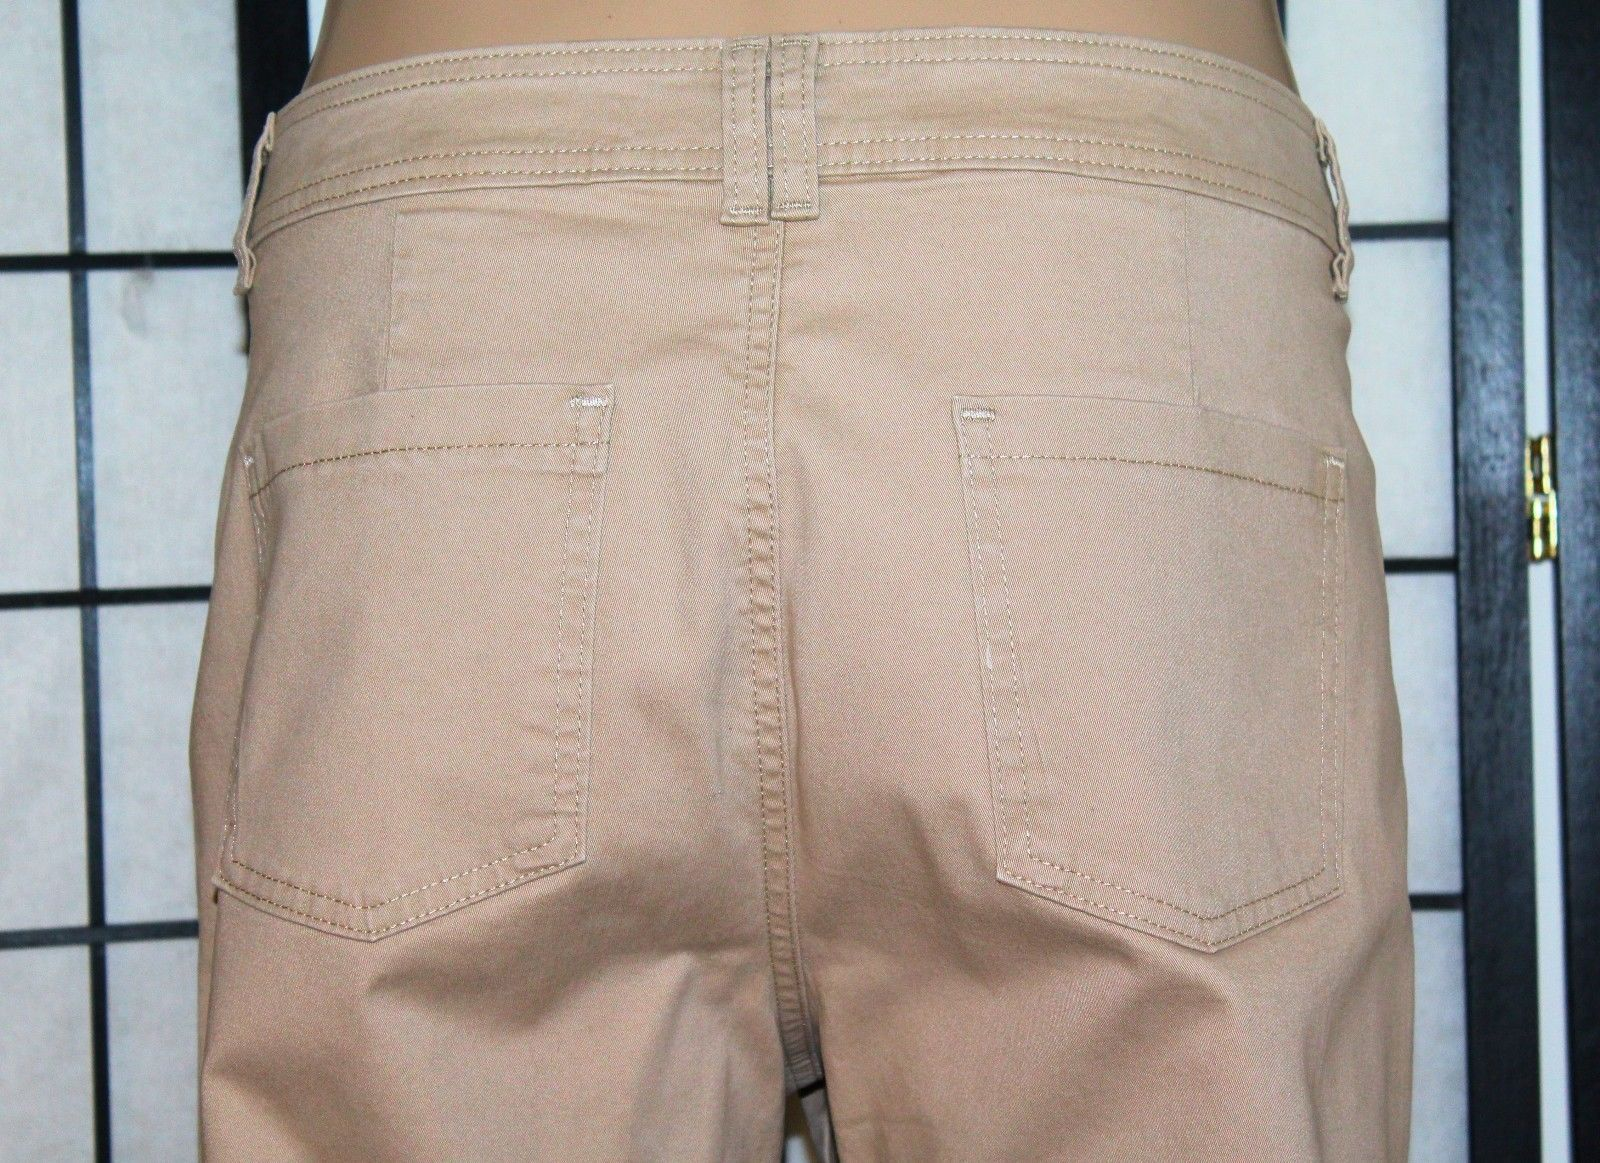 "LEE Classic Fit Women's Size 16 P Petite Straight Leg Stretch Pants 28"" Inseam"